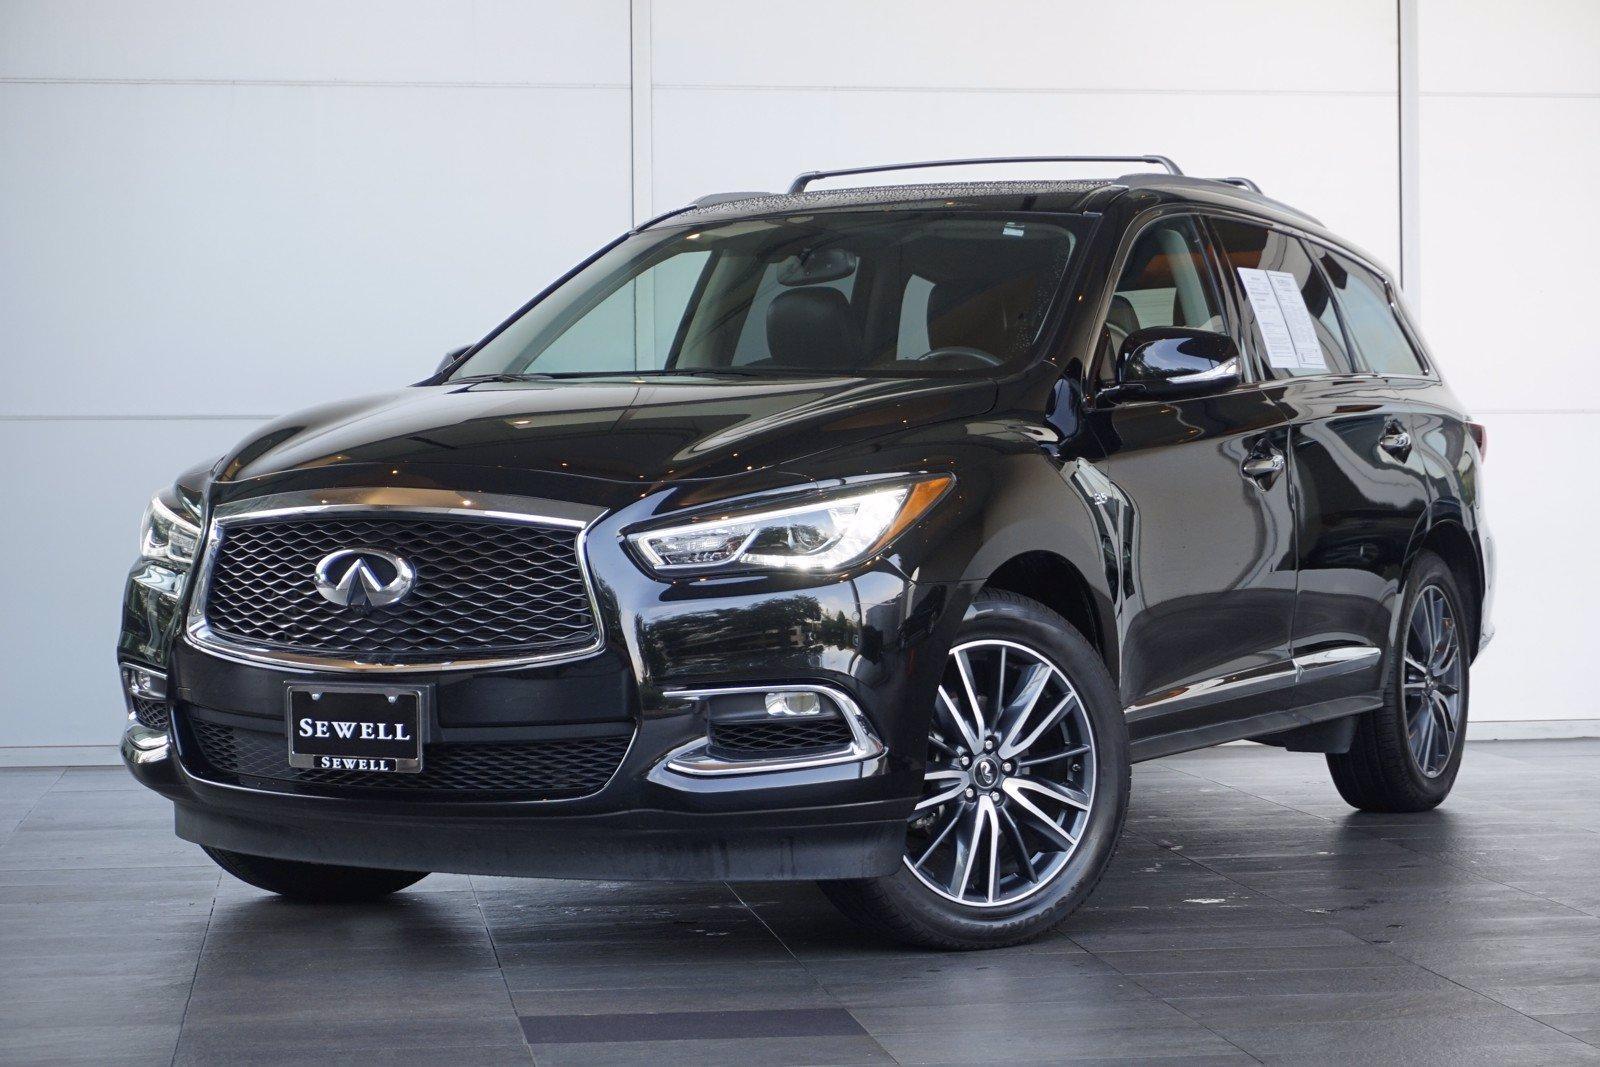 2018 INFINITI QX60 Vehicle Photo in Houston, TX 77079